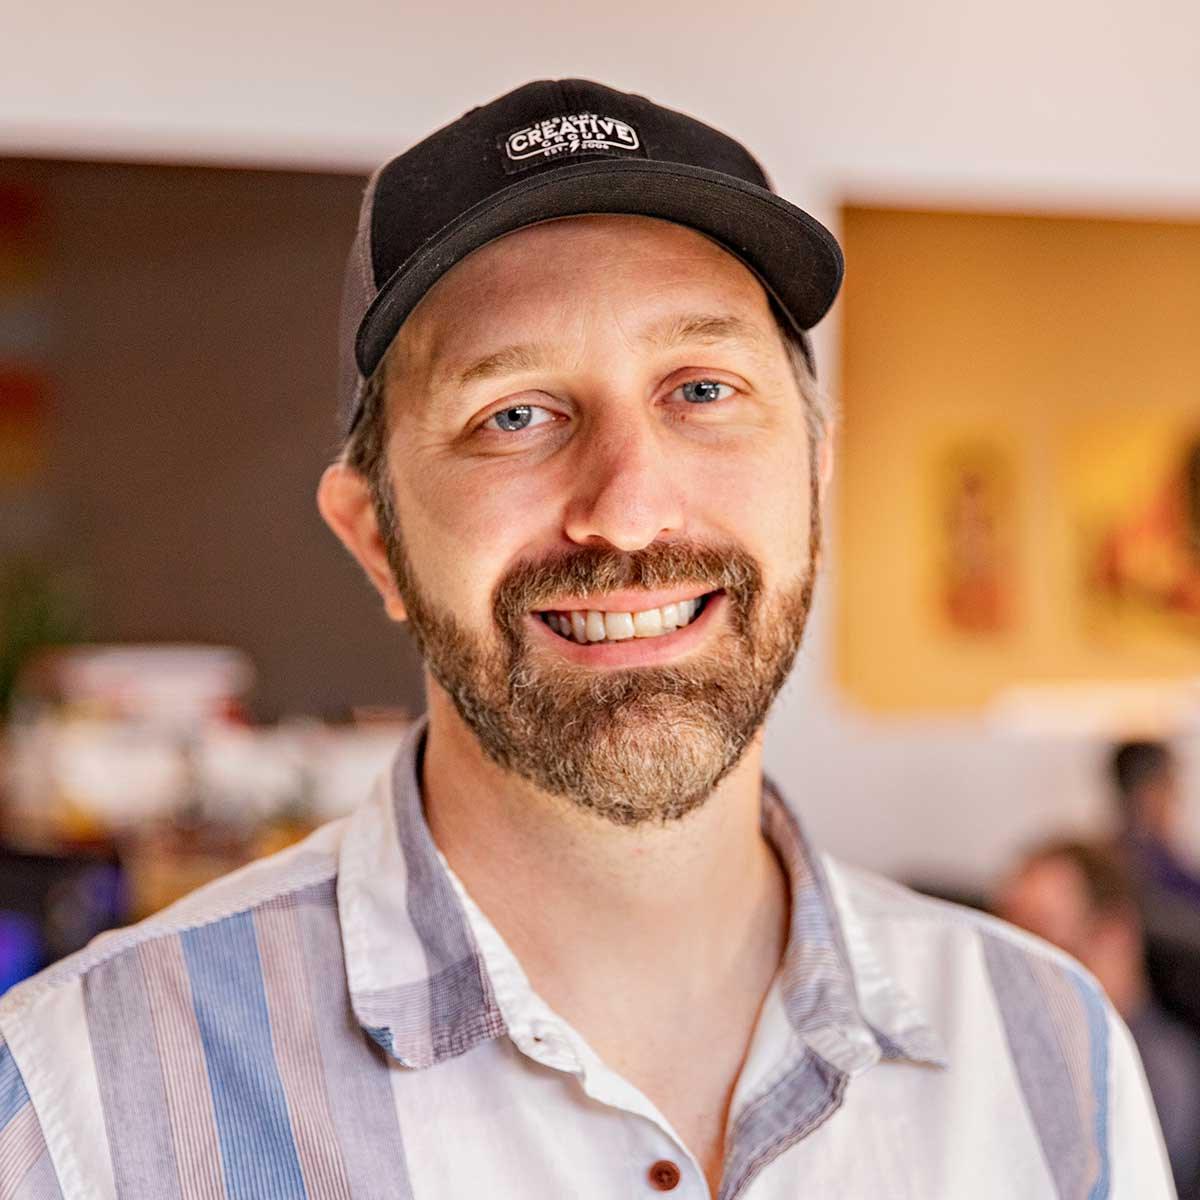 Jason Gwynn, Video Specialist at Insight Creative Group